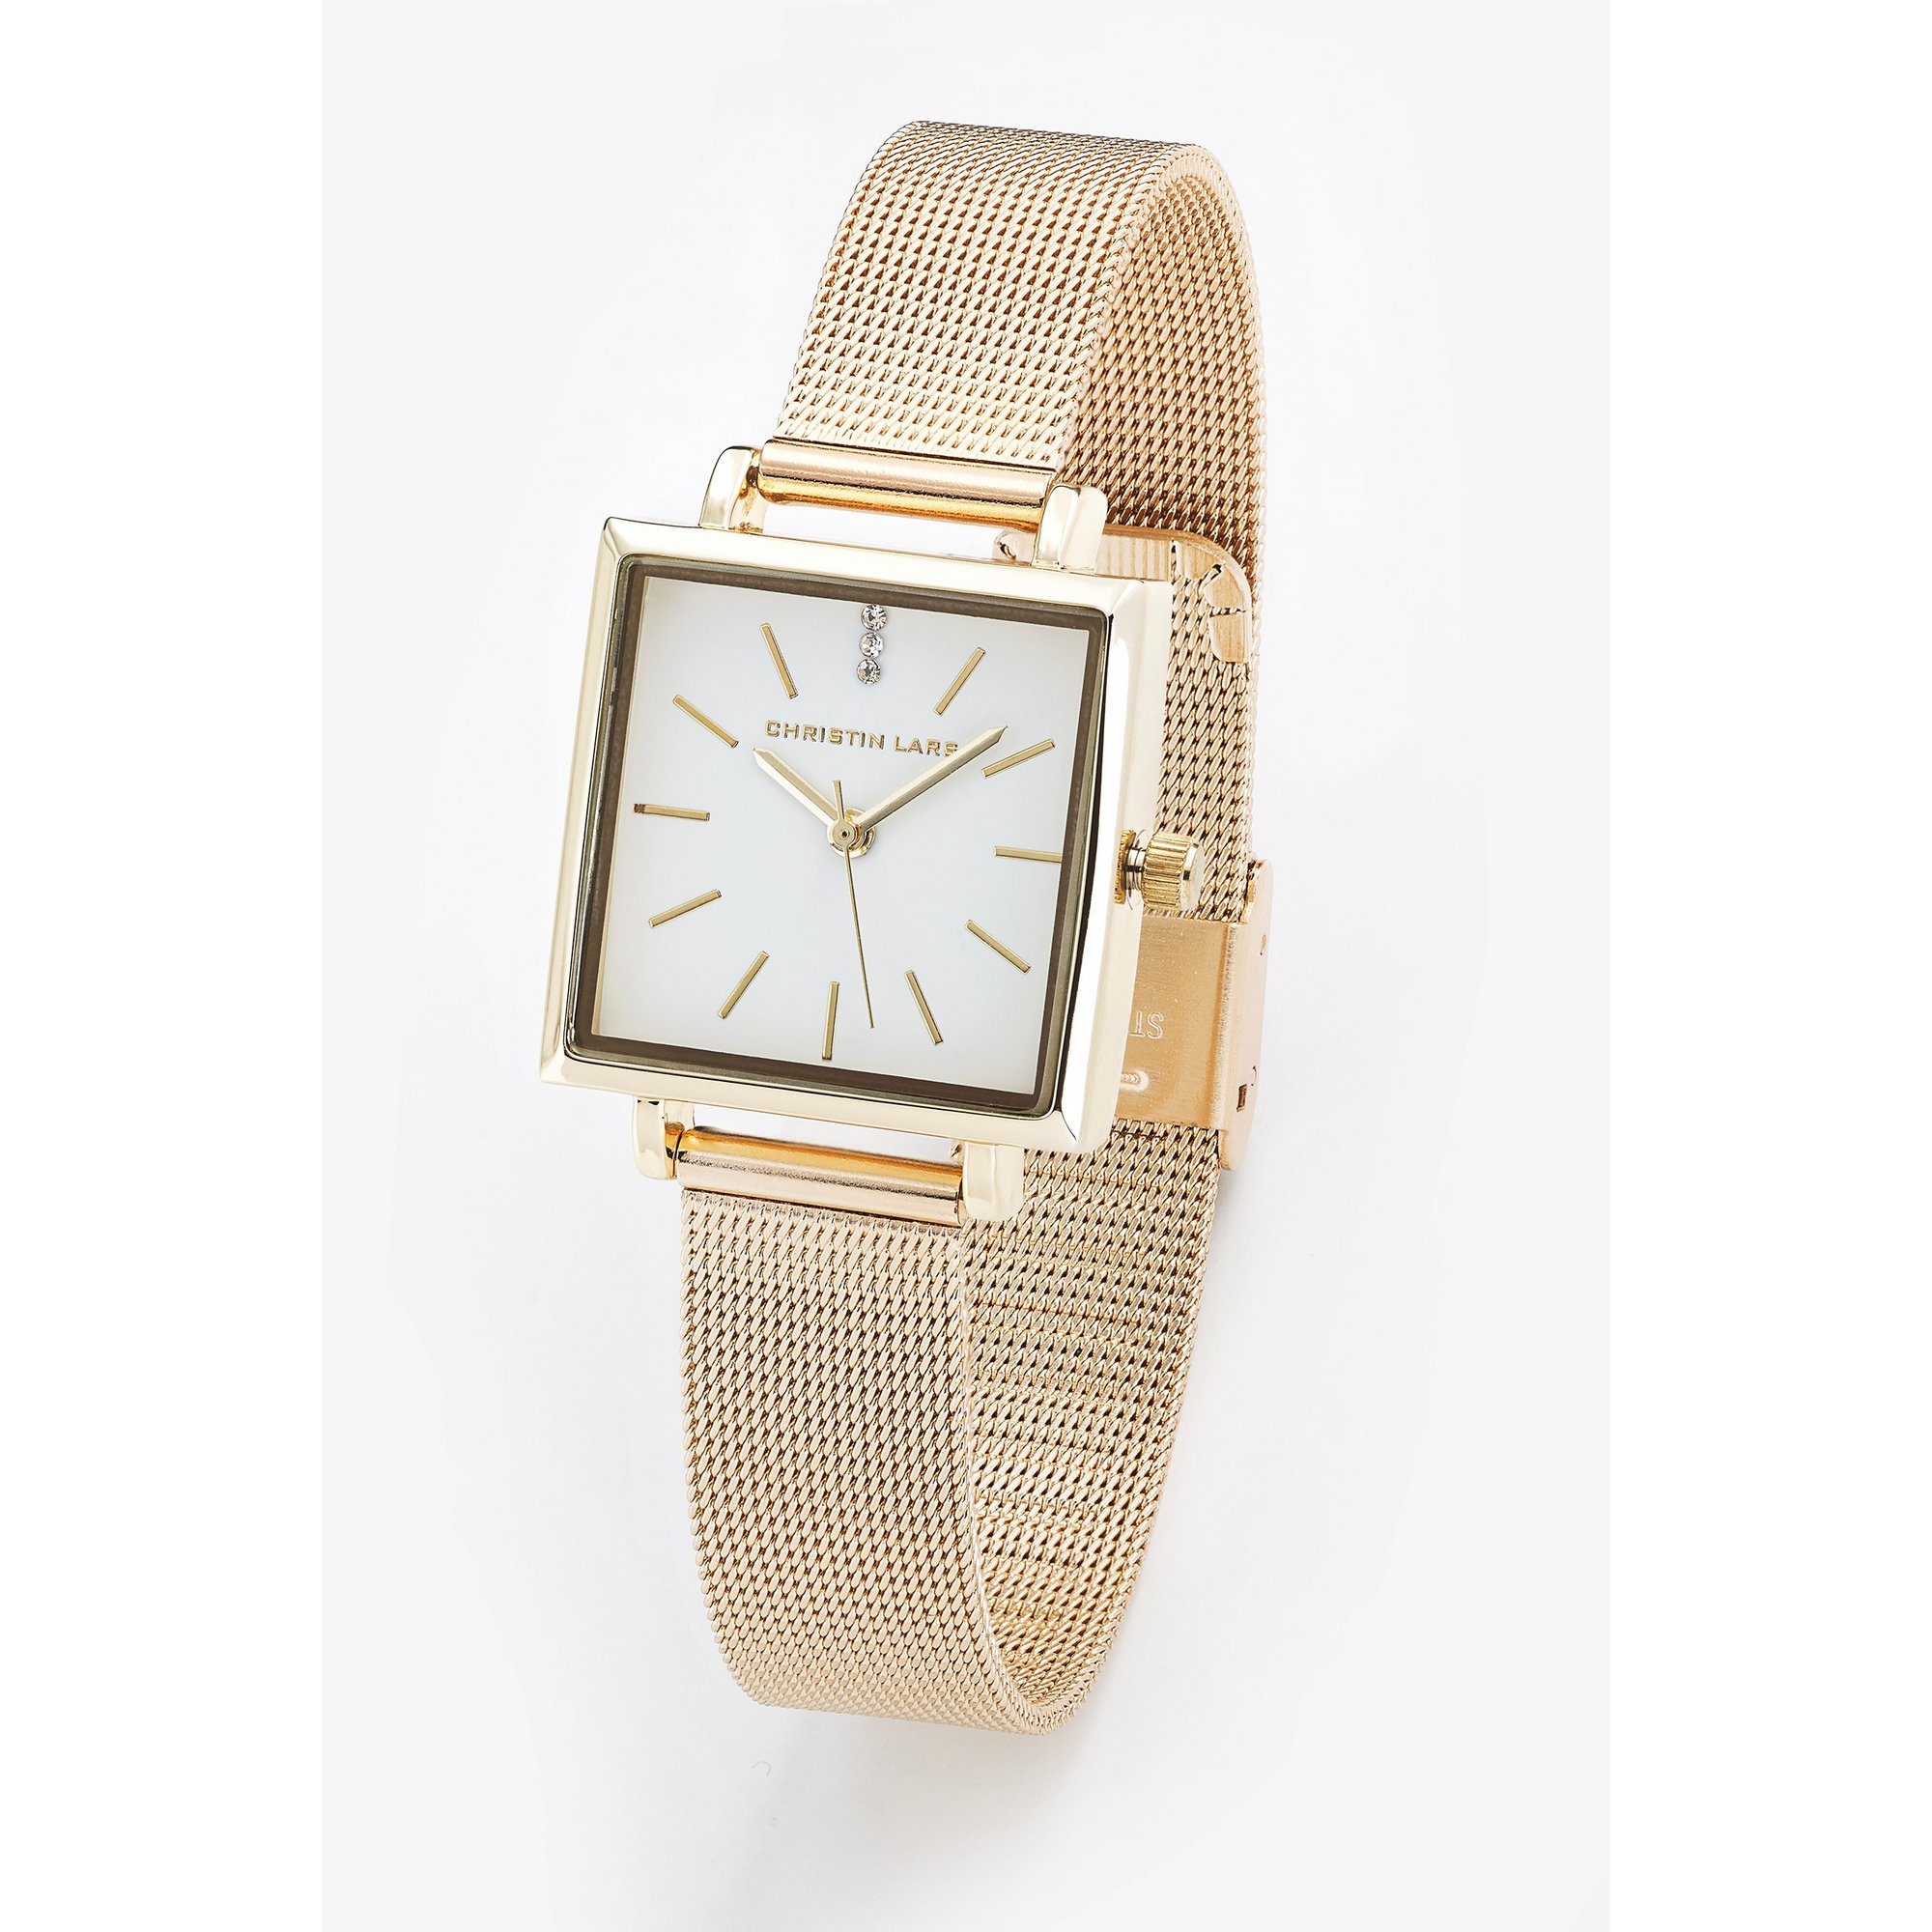 Image of Christin Lars Gold Tone Mesh Style Bracelet Watch